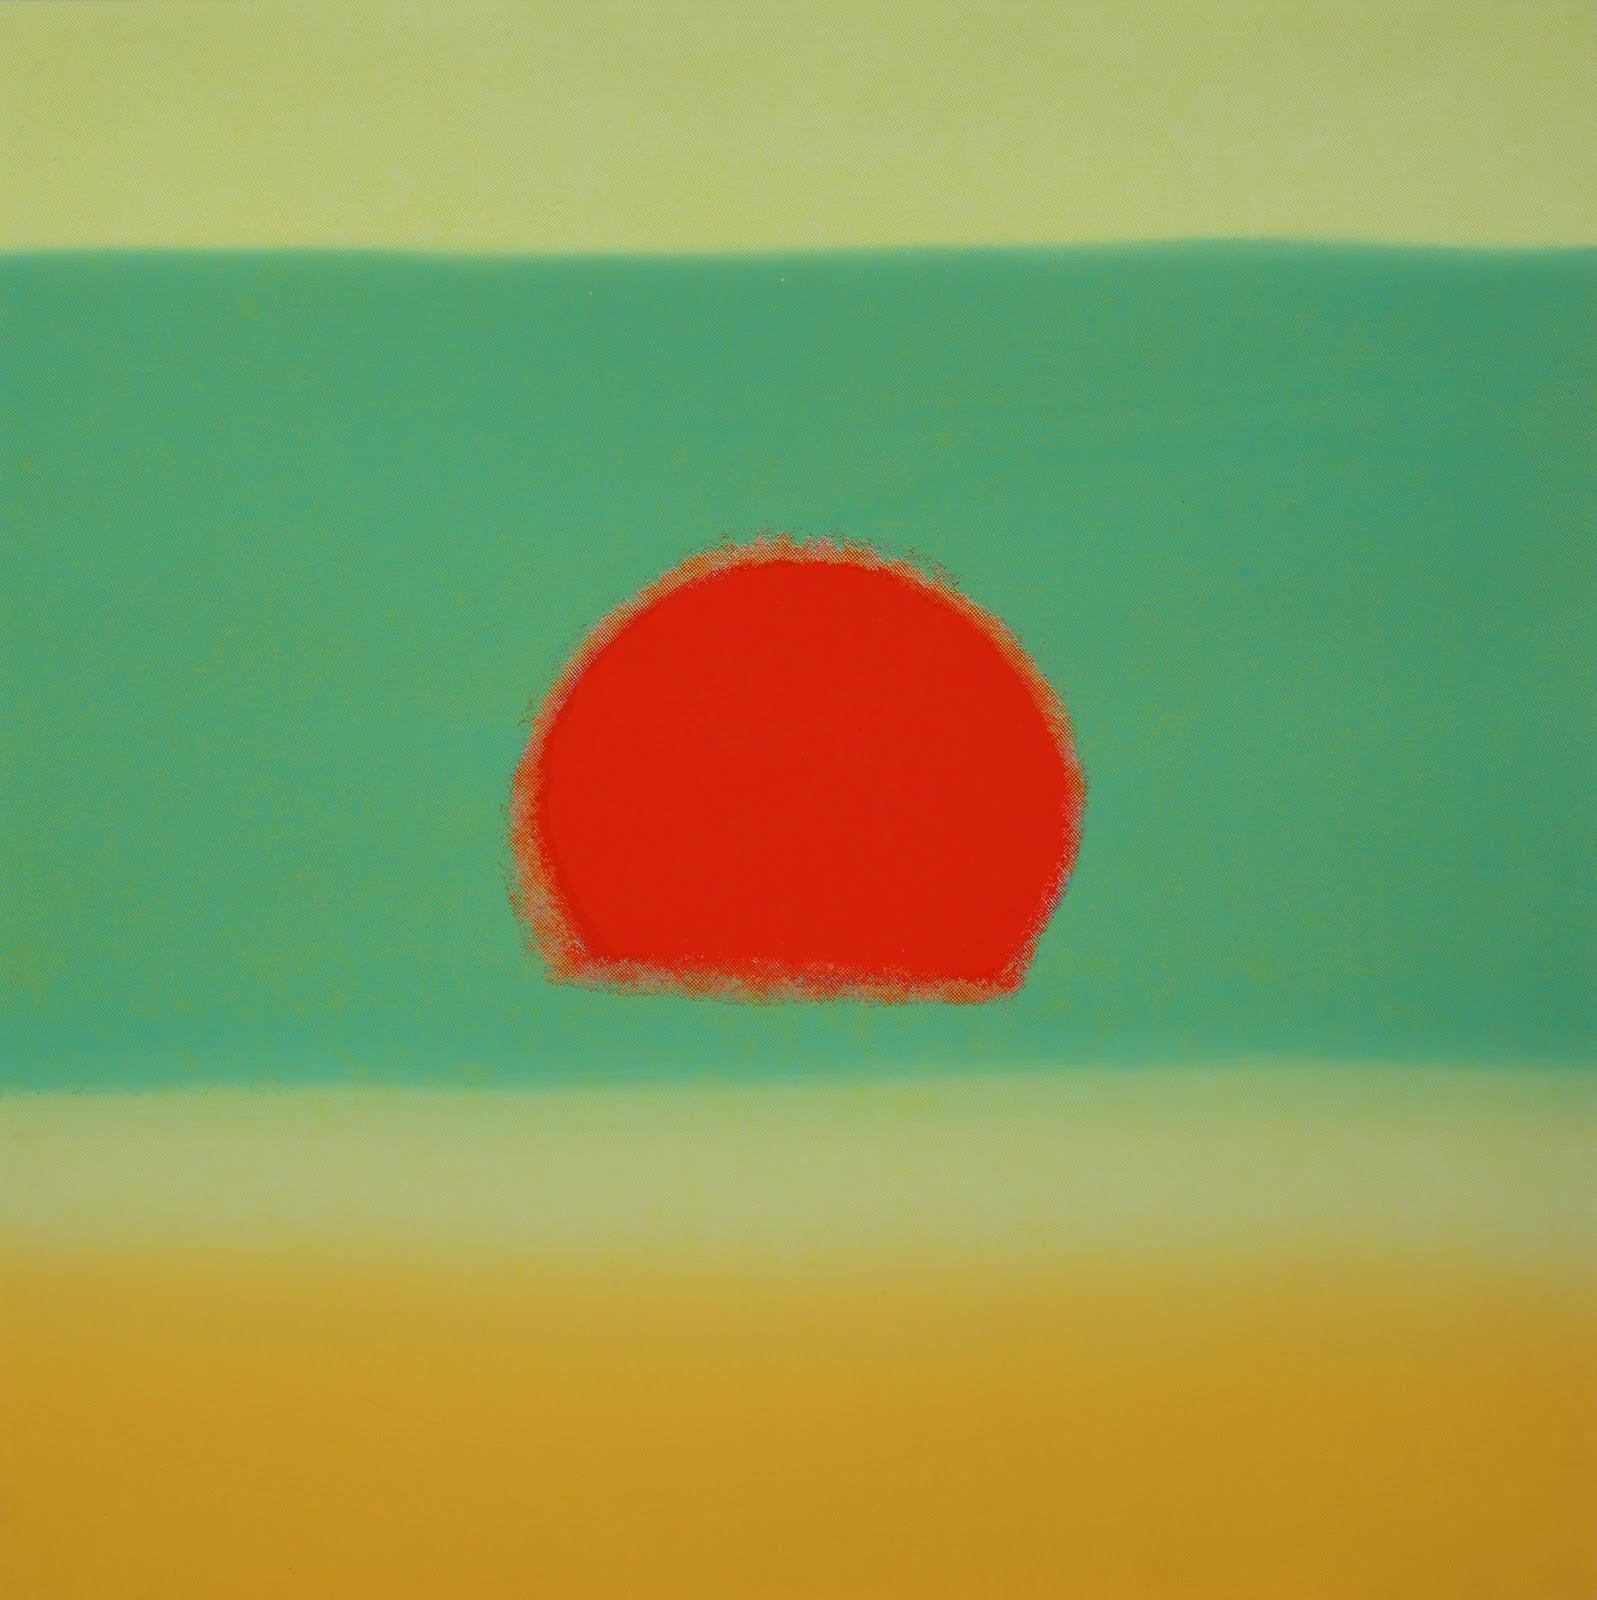 Bewicked Art Andy Warhol 15 Minutes Eternal